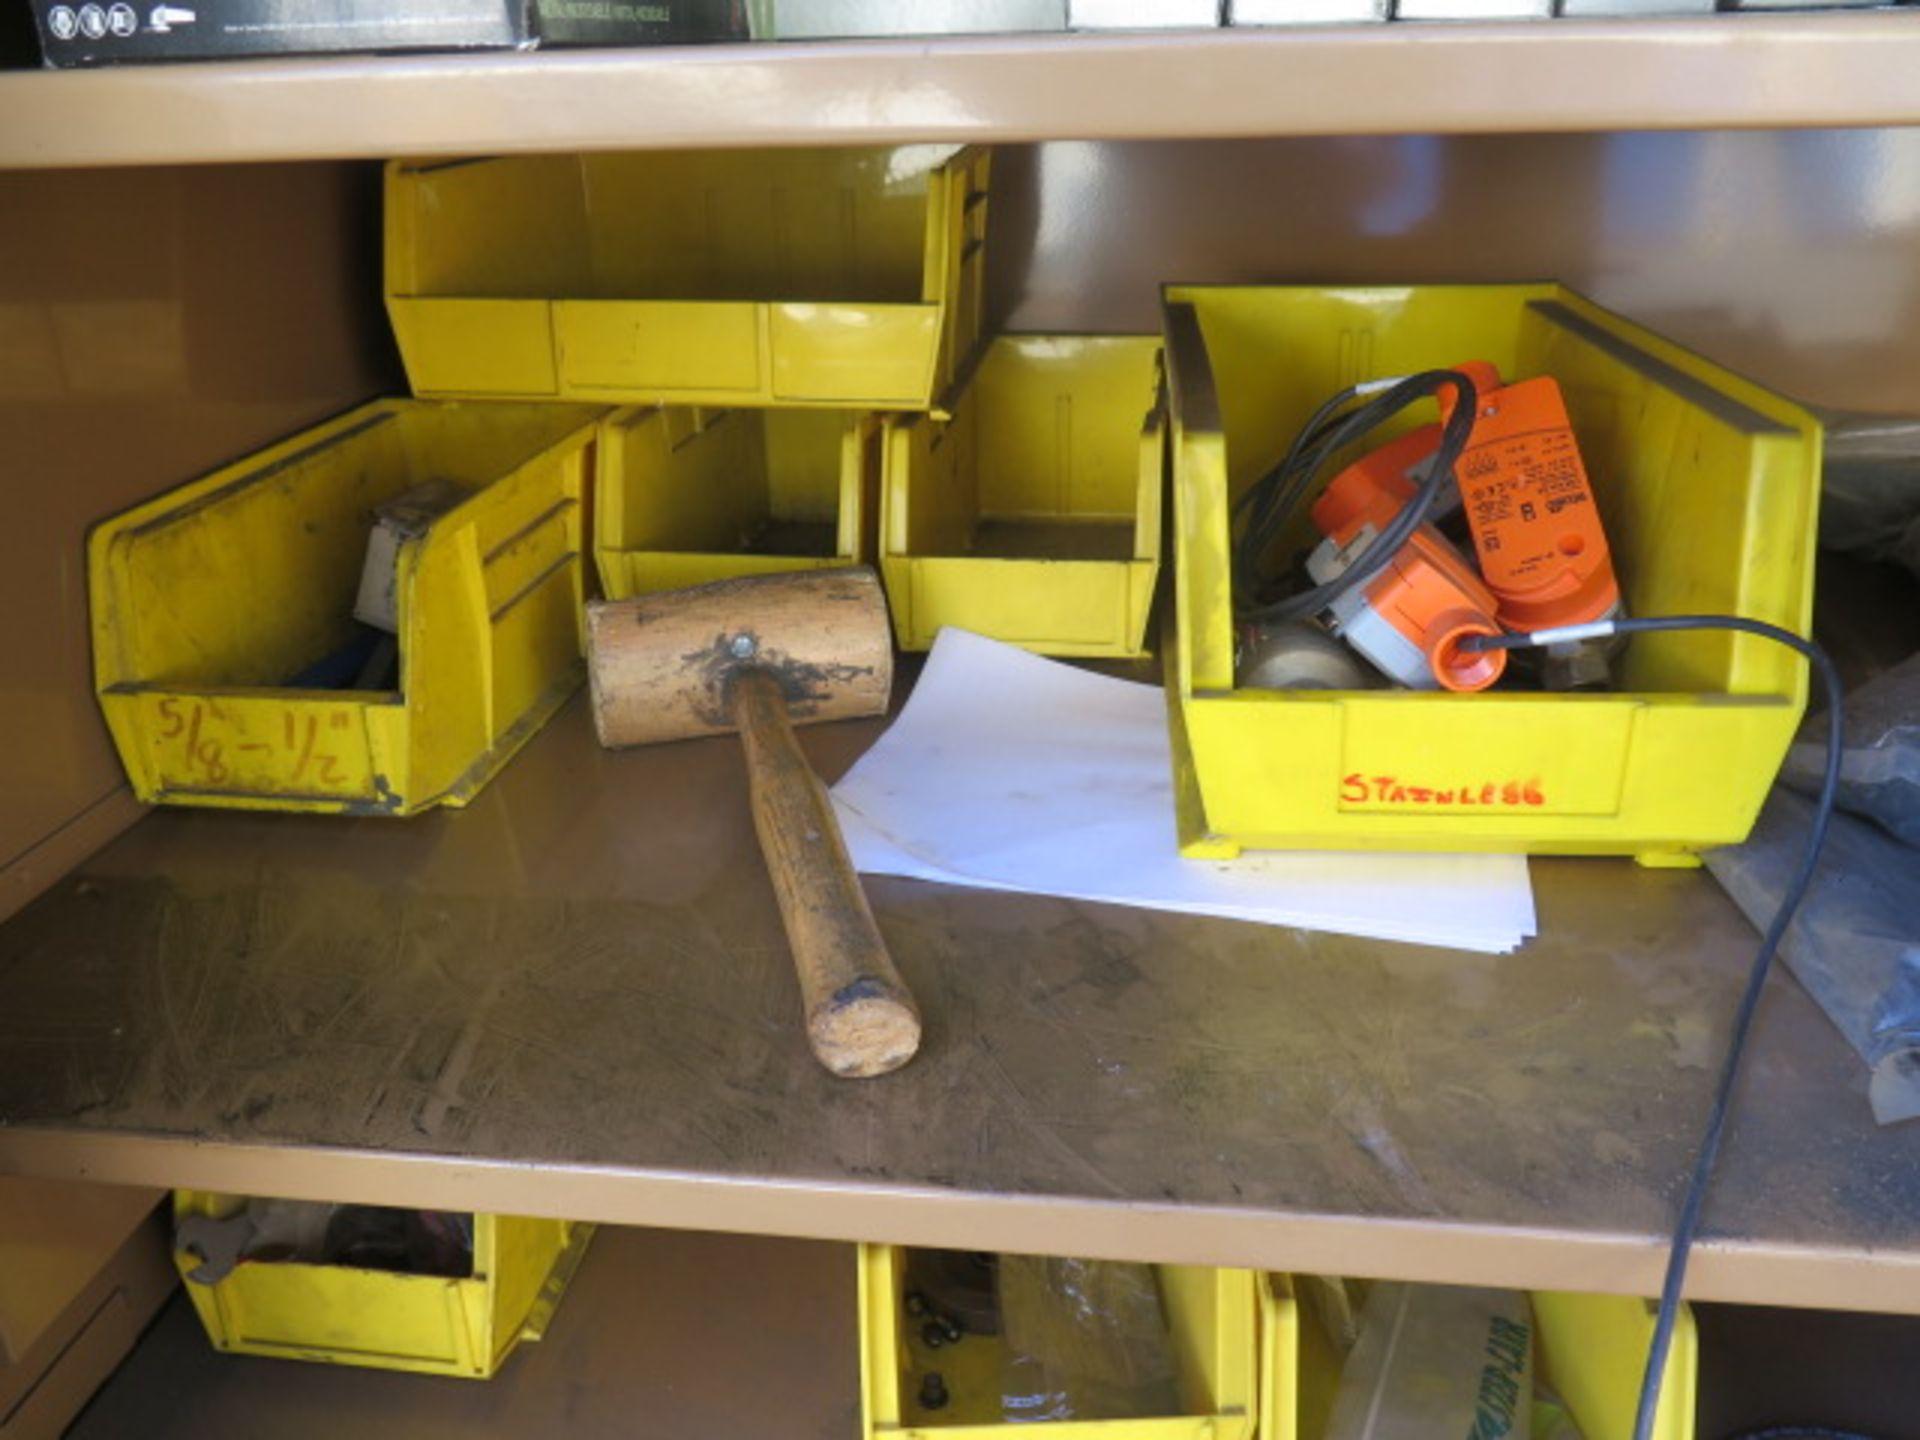 Knaack mdl. 139 Jobmaster Job Box (SOLD AS-IS - NO WARRANTY) - Image 8 of 17